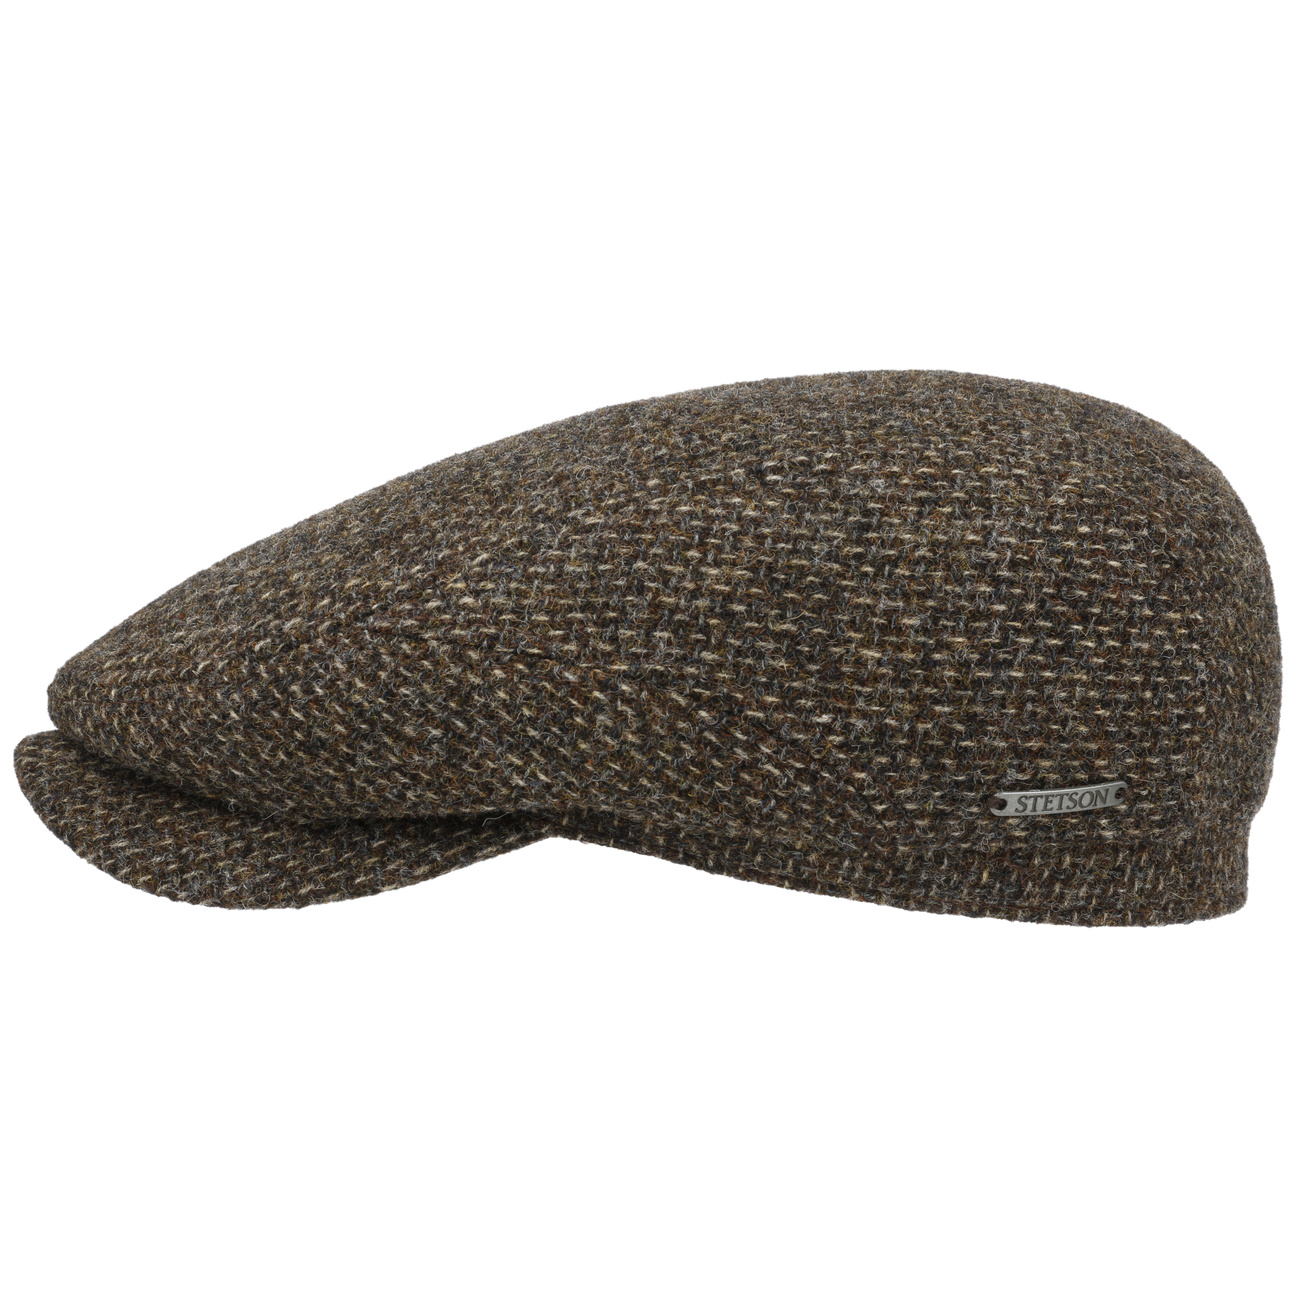 Gorra Belfast Tweed by Stetson - Gorras - sombreroshop.es b1de19bc67b